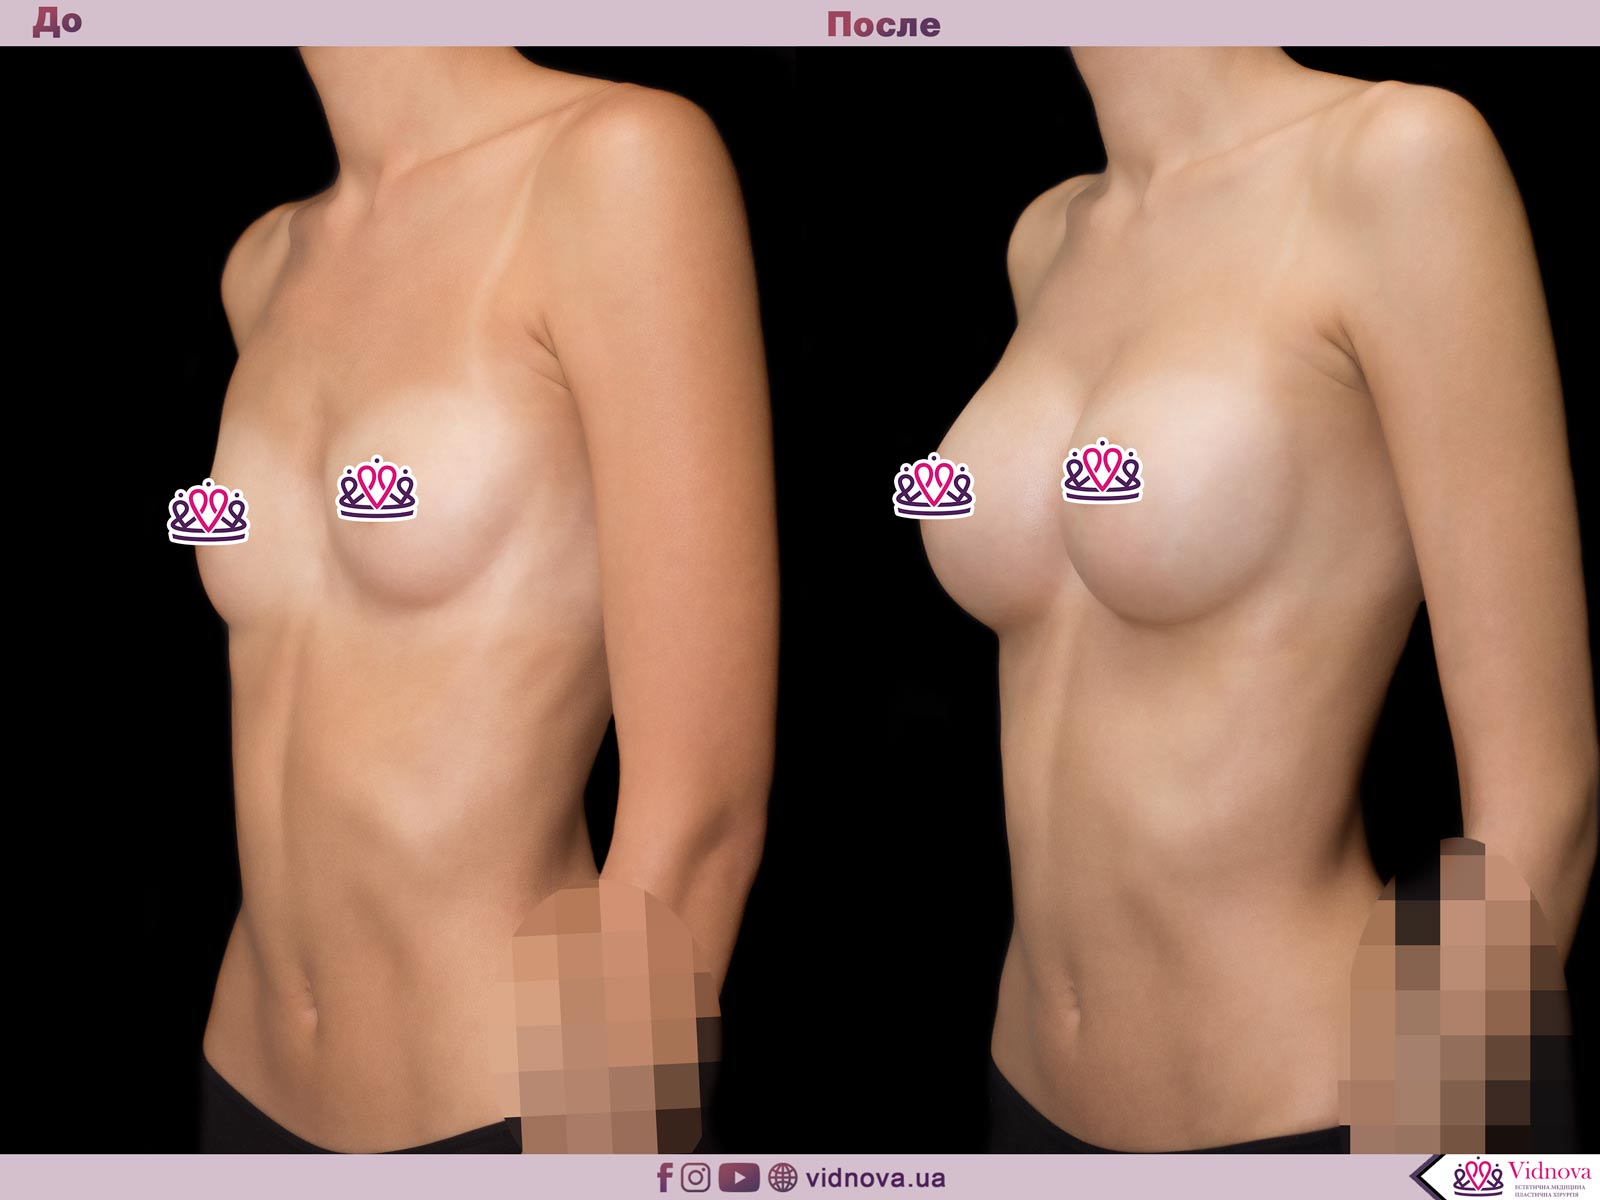 Увеличение груди: Фото ДО и ПОСЛЕ - Пример №38-2 - Клиника Vidnova